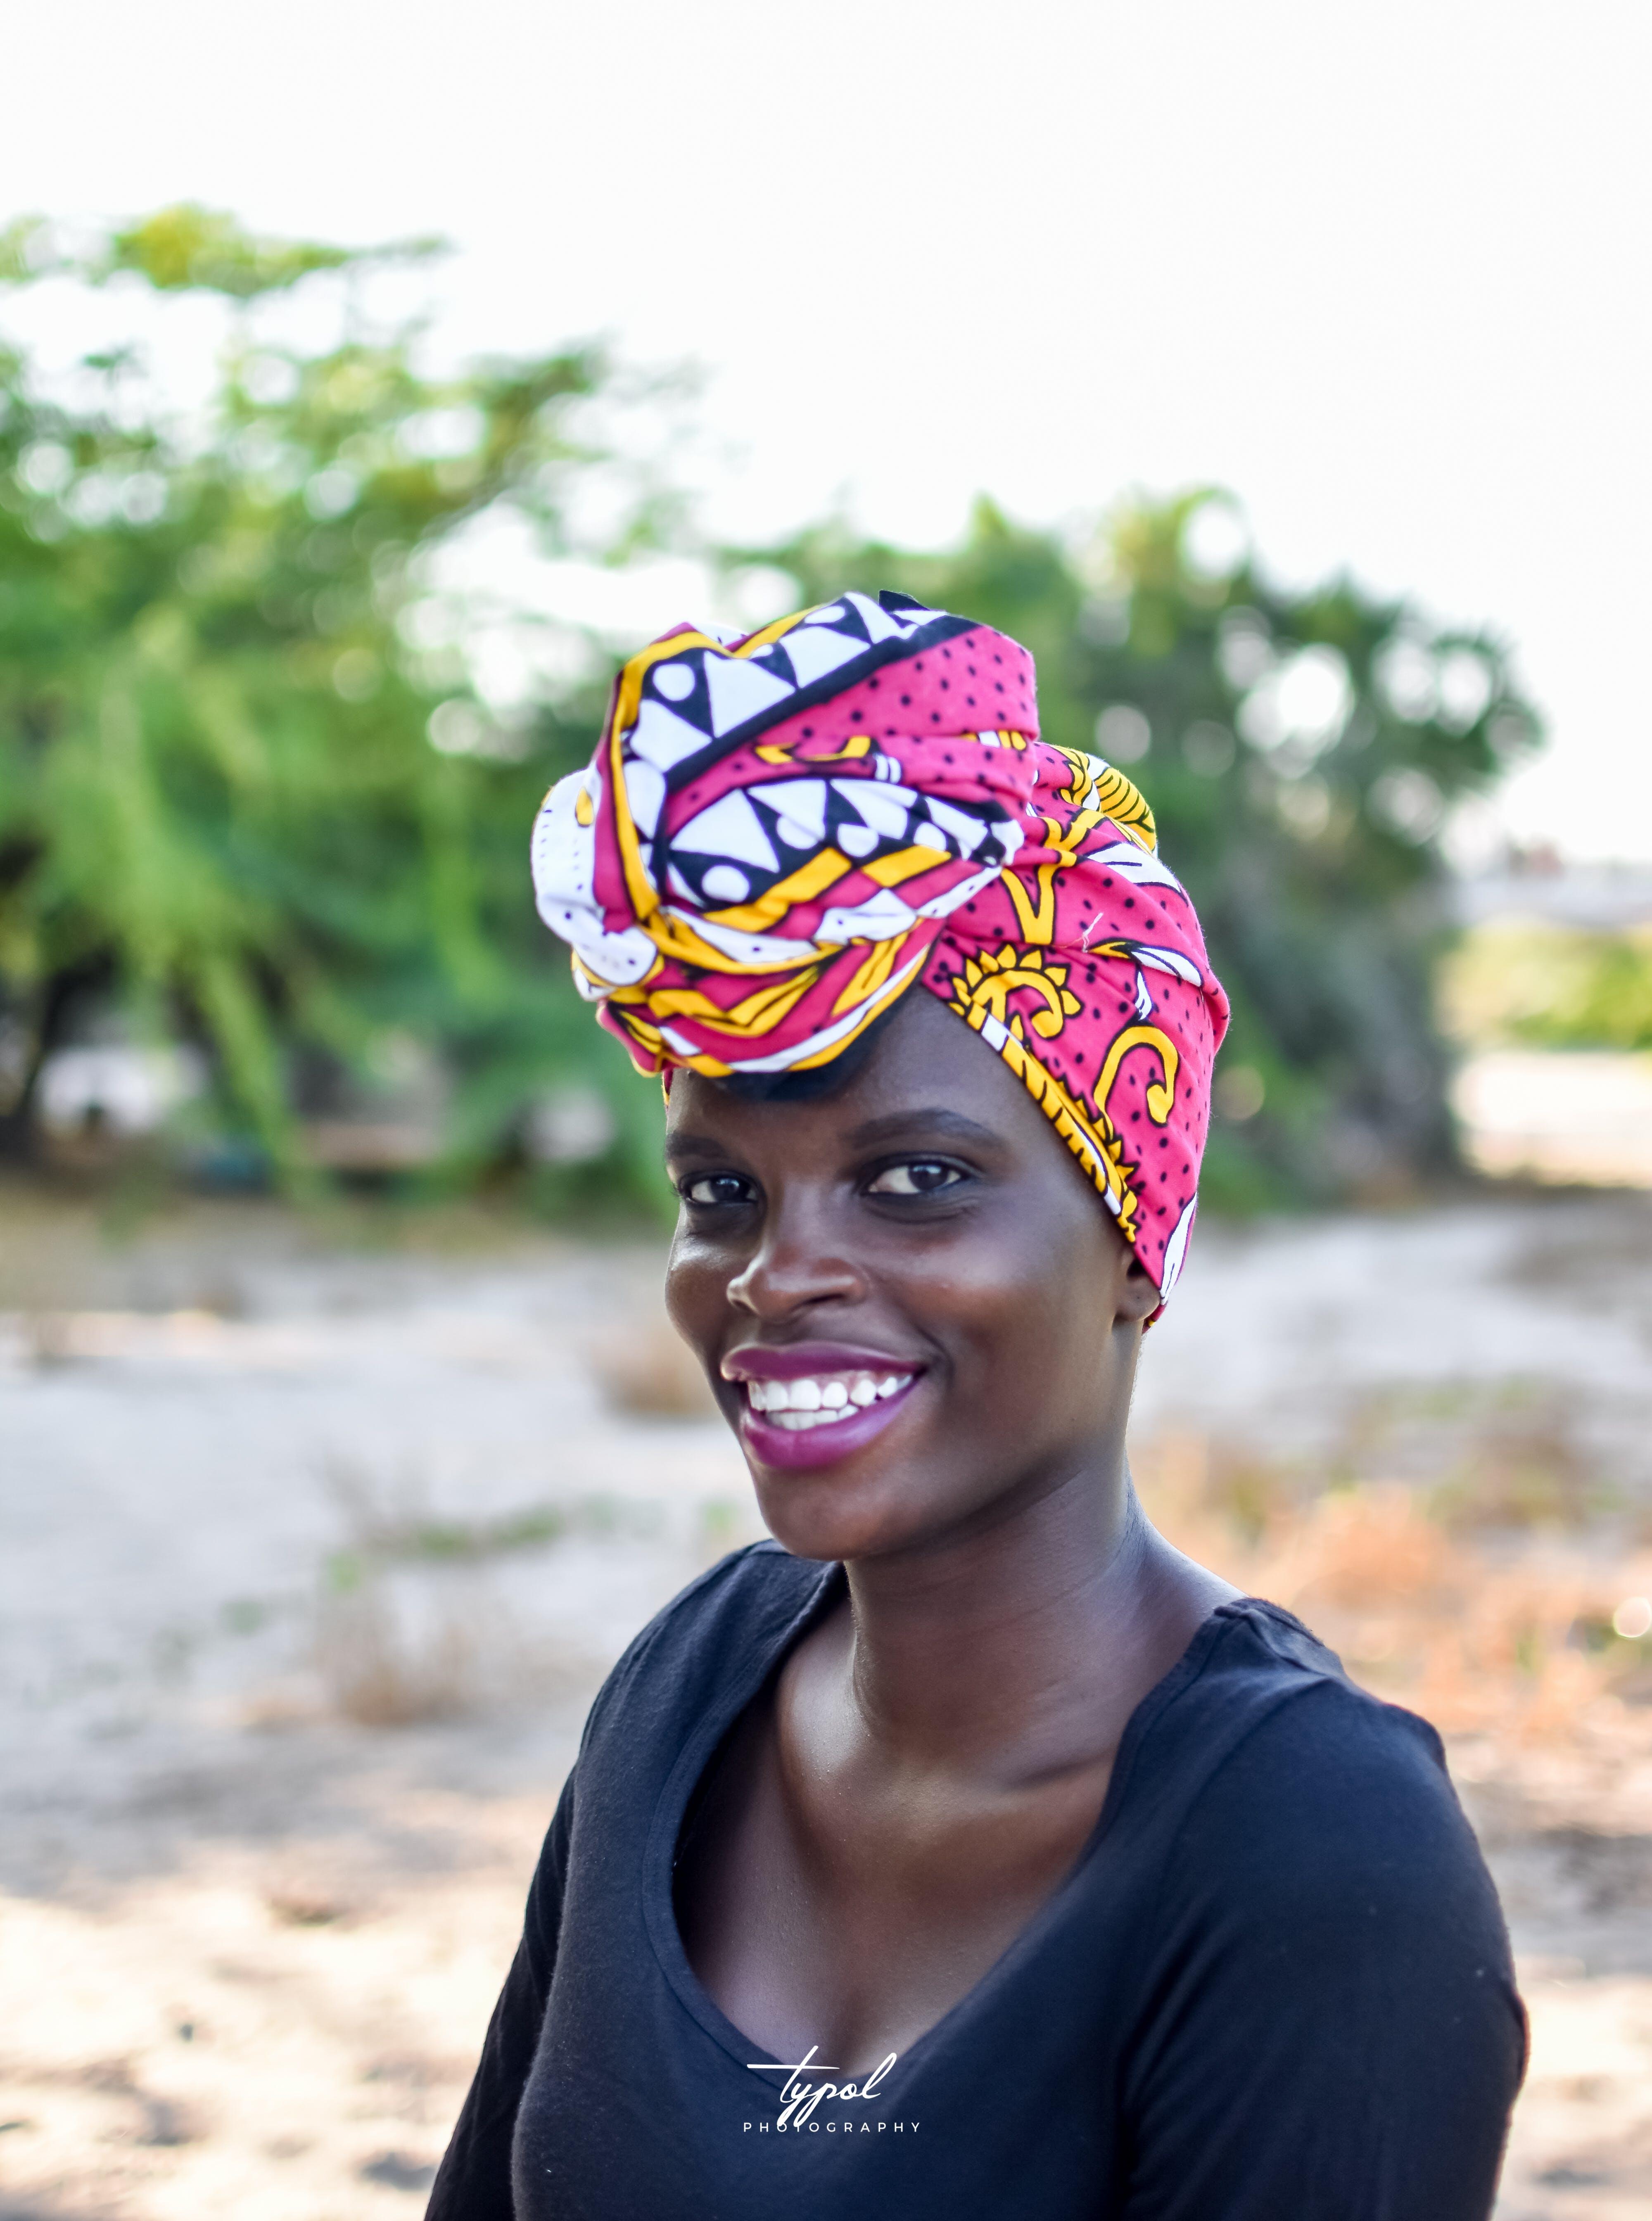 Free stock photo of african portrait, african wear dress, african women